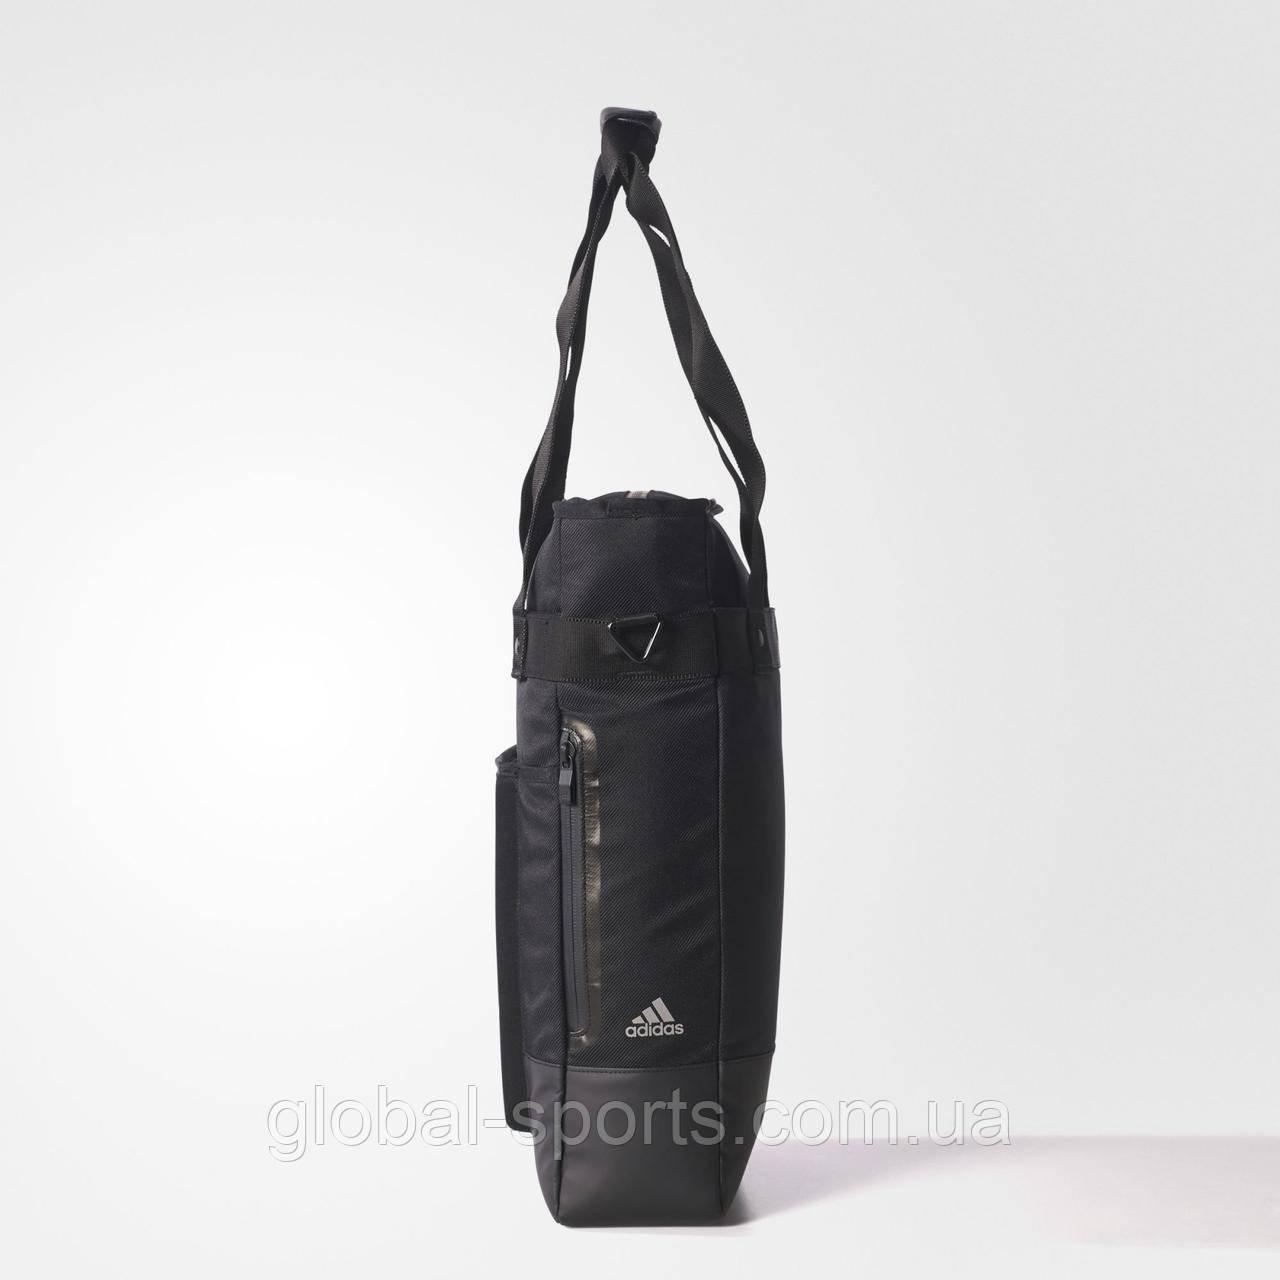 509c17c769c6 спортивная сумка Adidas Porsche Design Driveартикулax5472